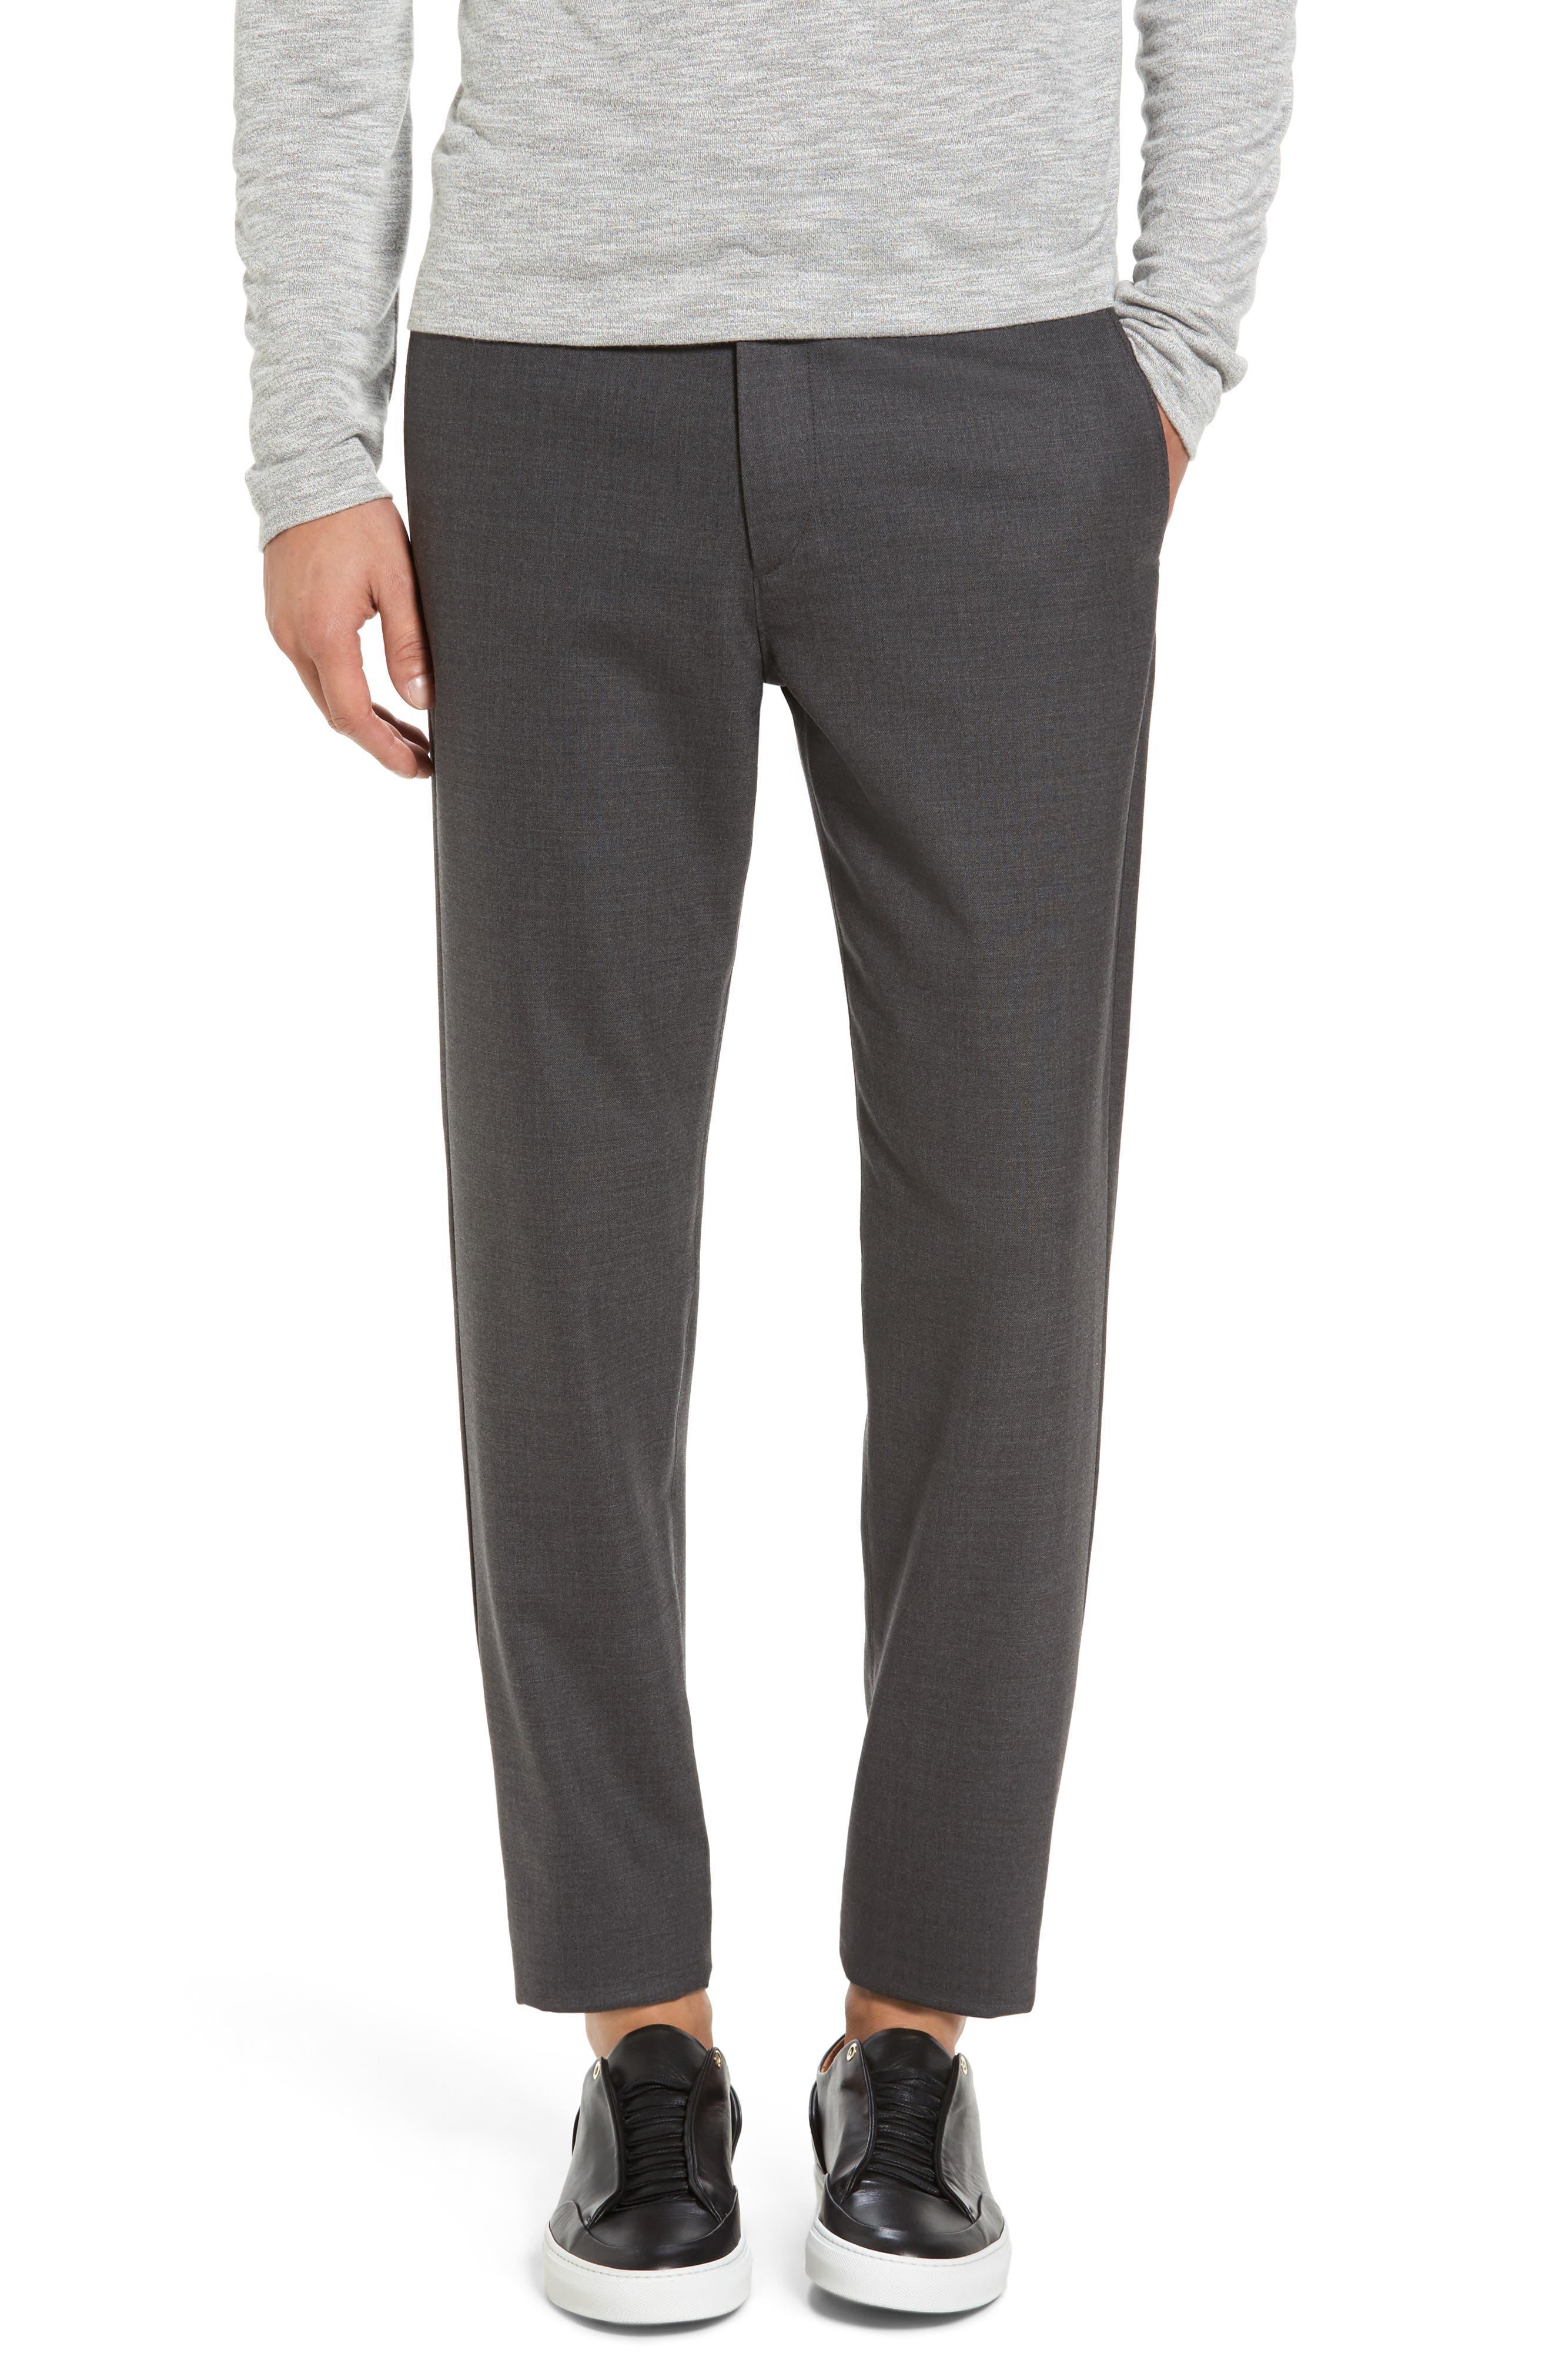 Zaine Gearheart Slim Straight Pants,                         Main,                         color, Medium Charcoal